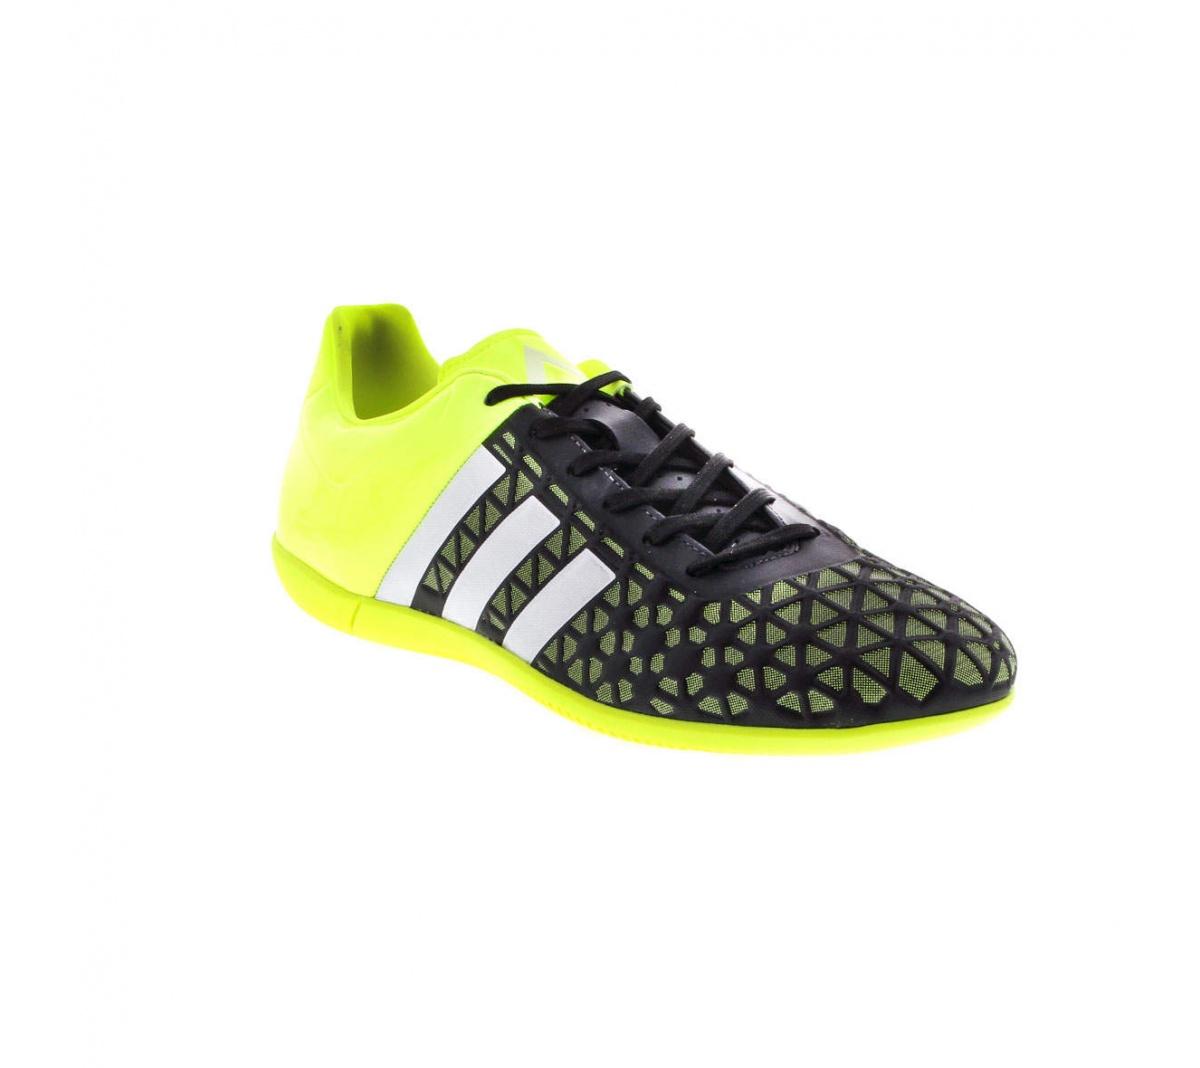 45232c7b9e Tenis Adidas Ace 15.3 Futsal Tenis Adidas Ace 15.3 Futsal ...